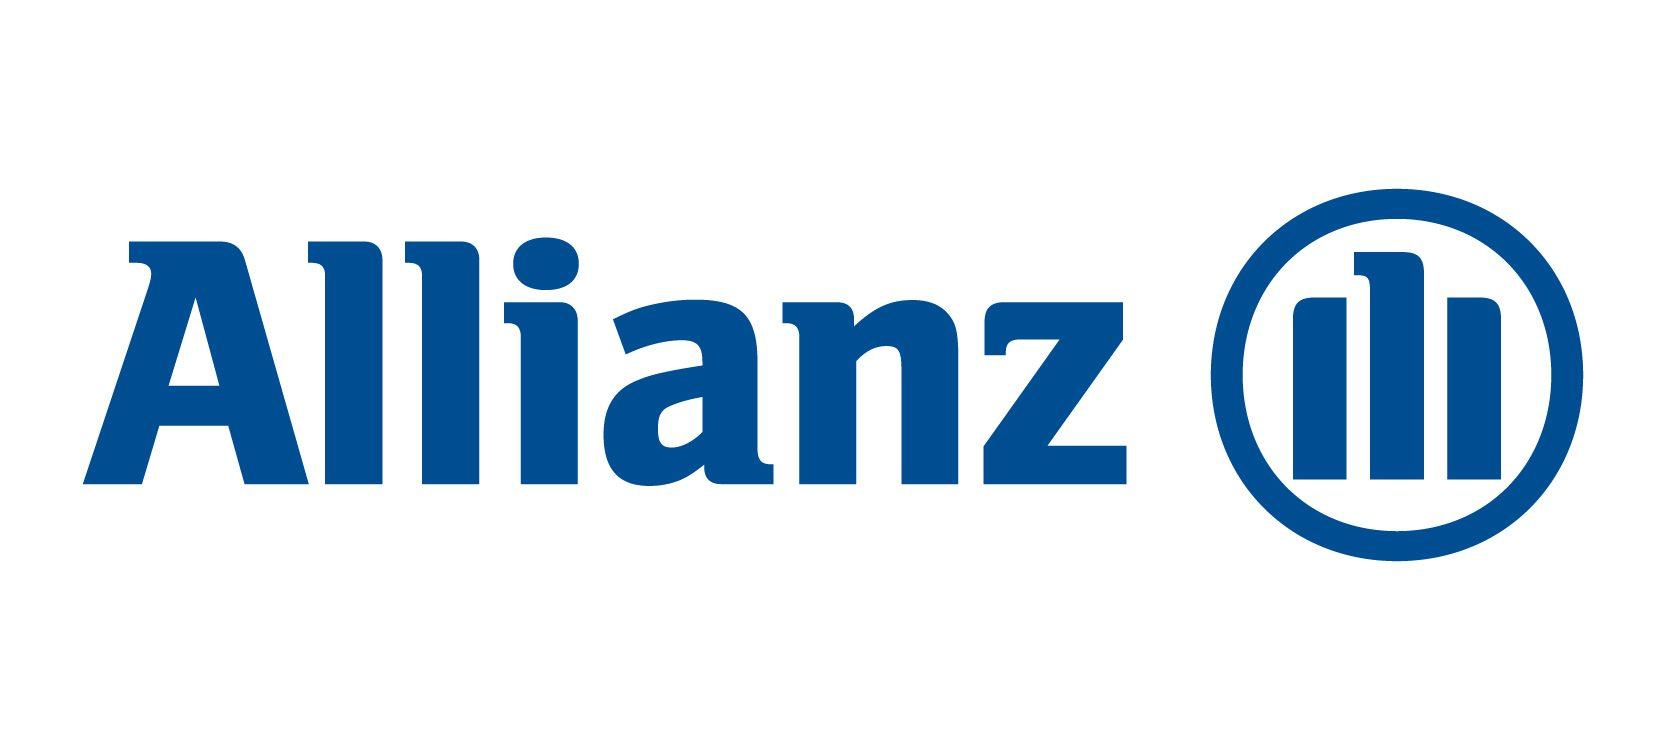 Allianz Přeštice